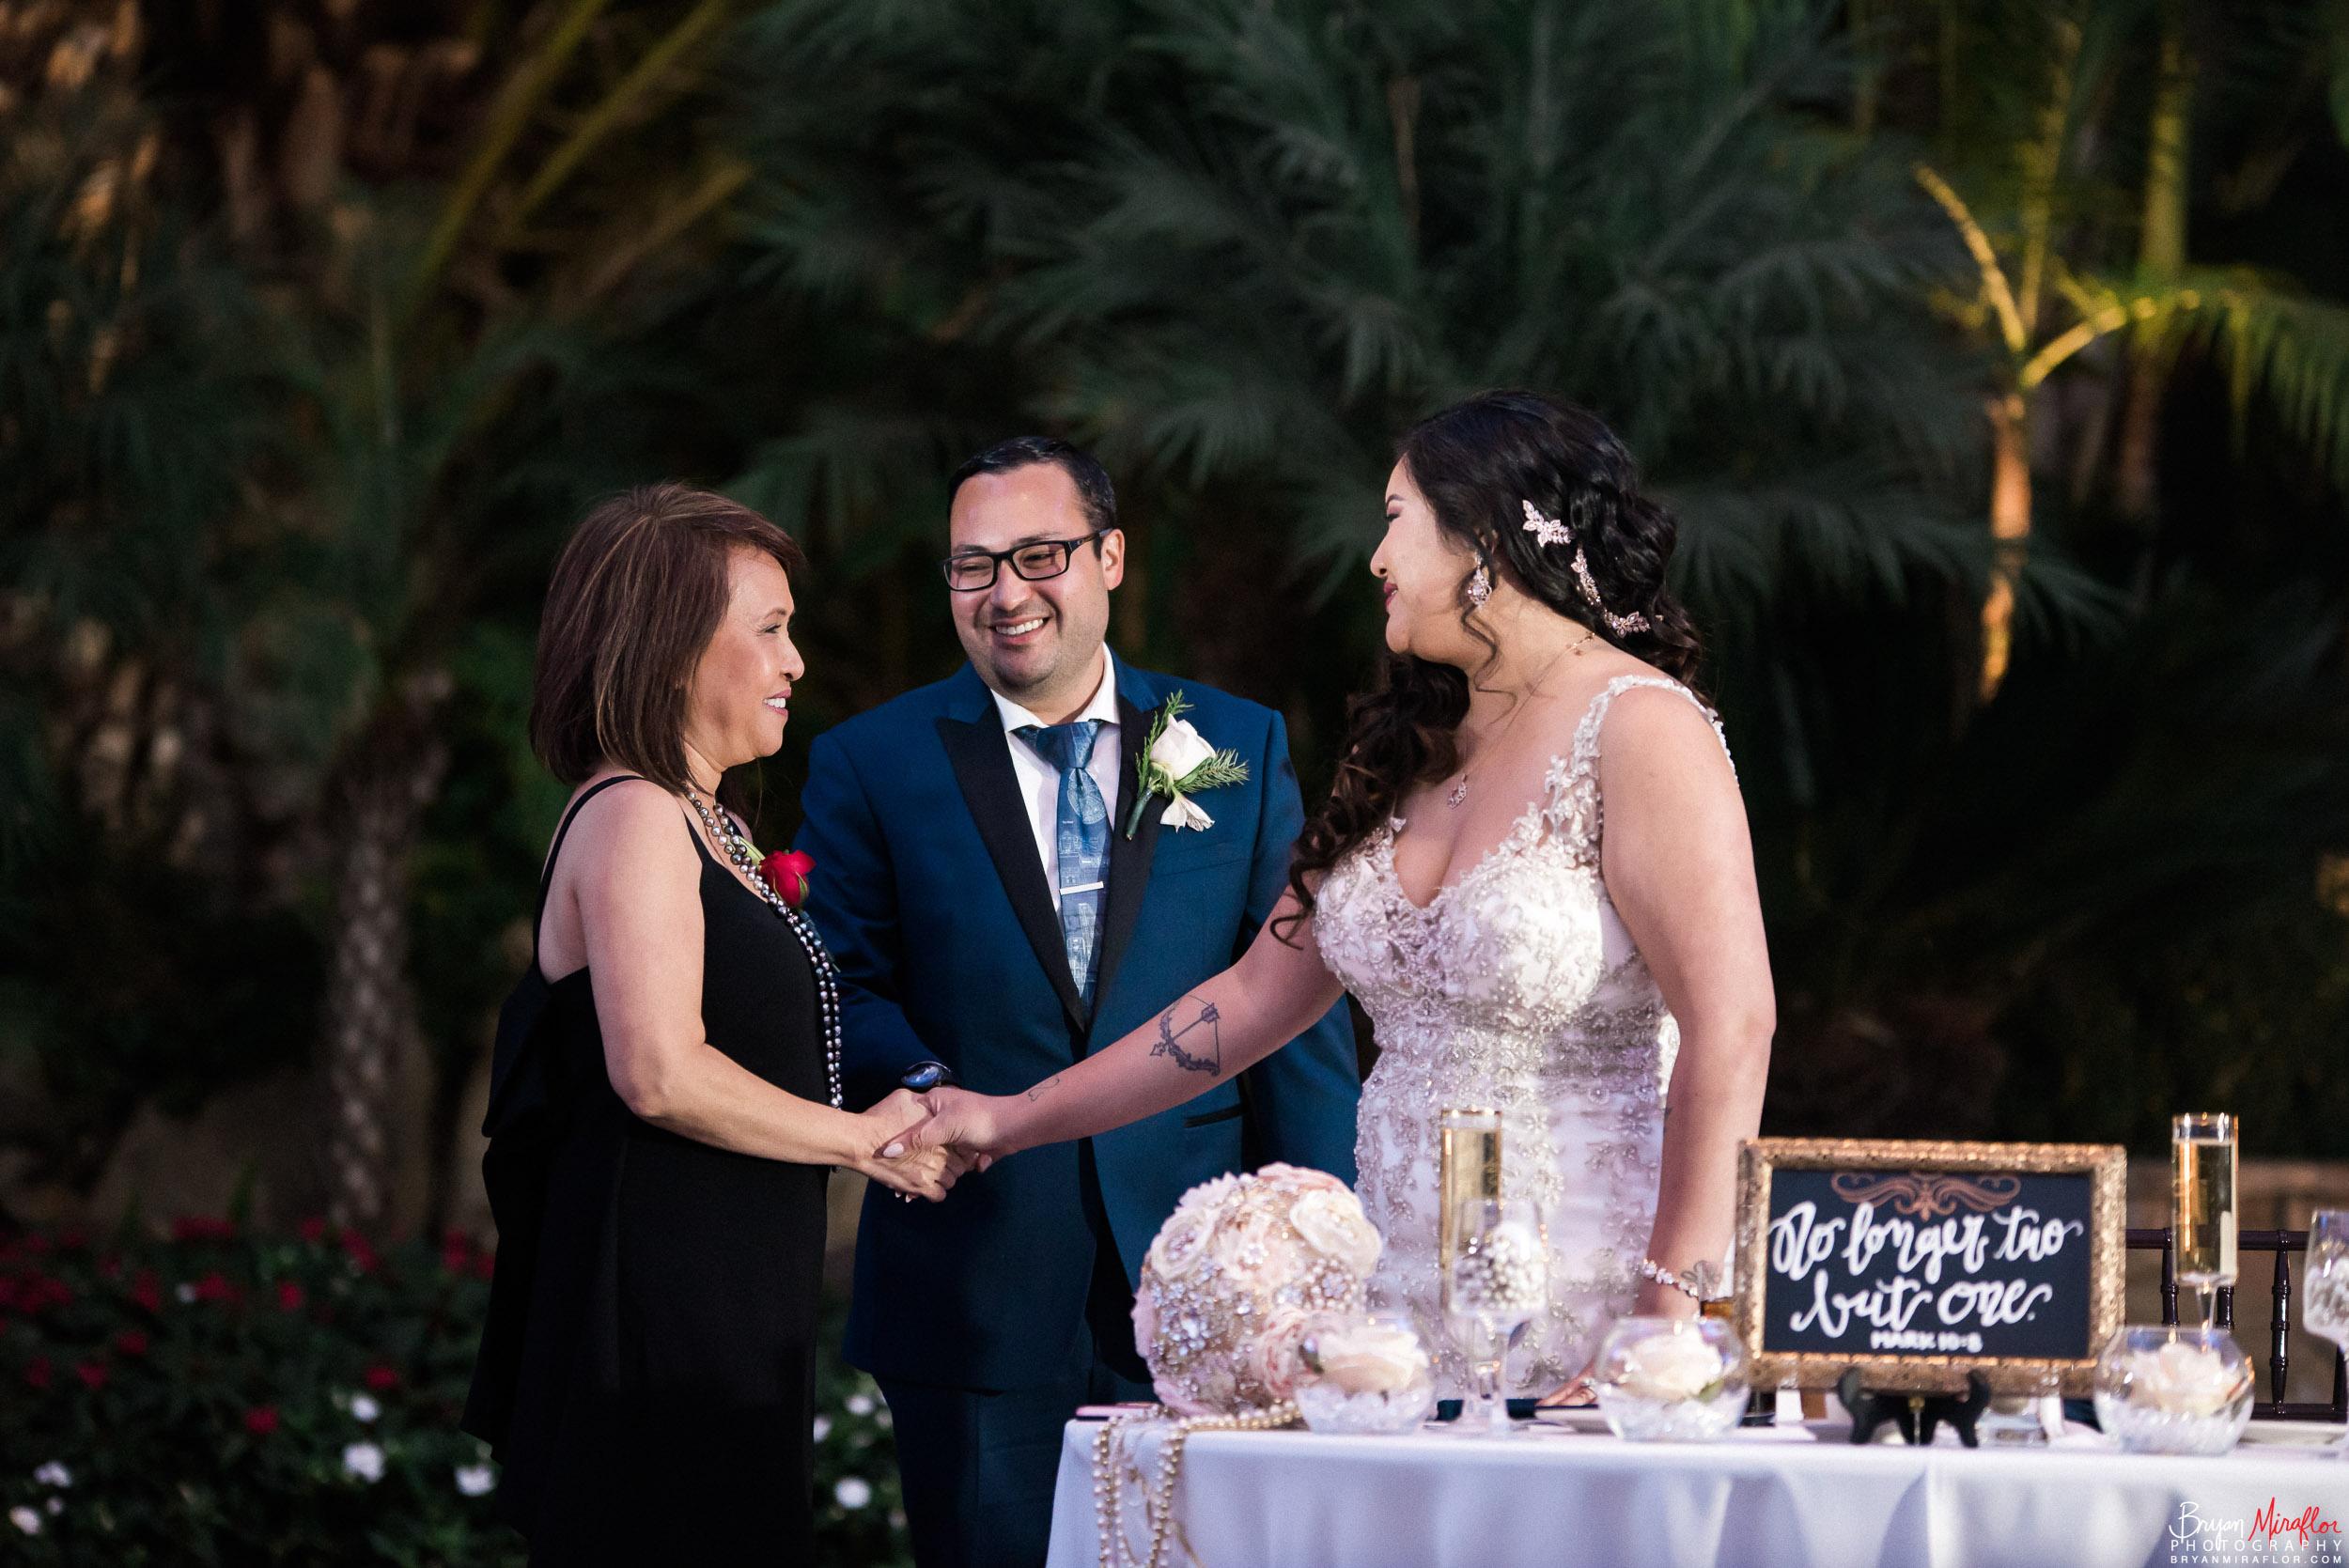 Bryan-Miraflor-Photography-Hannah-Jonathan-Married-Grand-Traditions-Estate-Gardens-Fallbrook-20171222-189.jpg